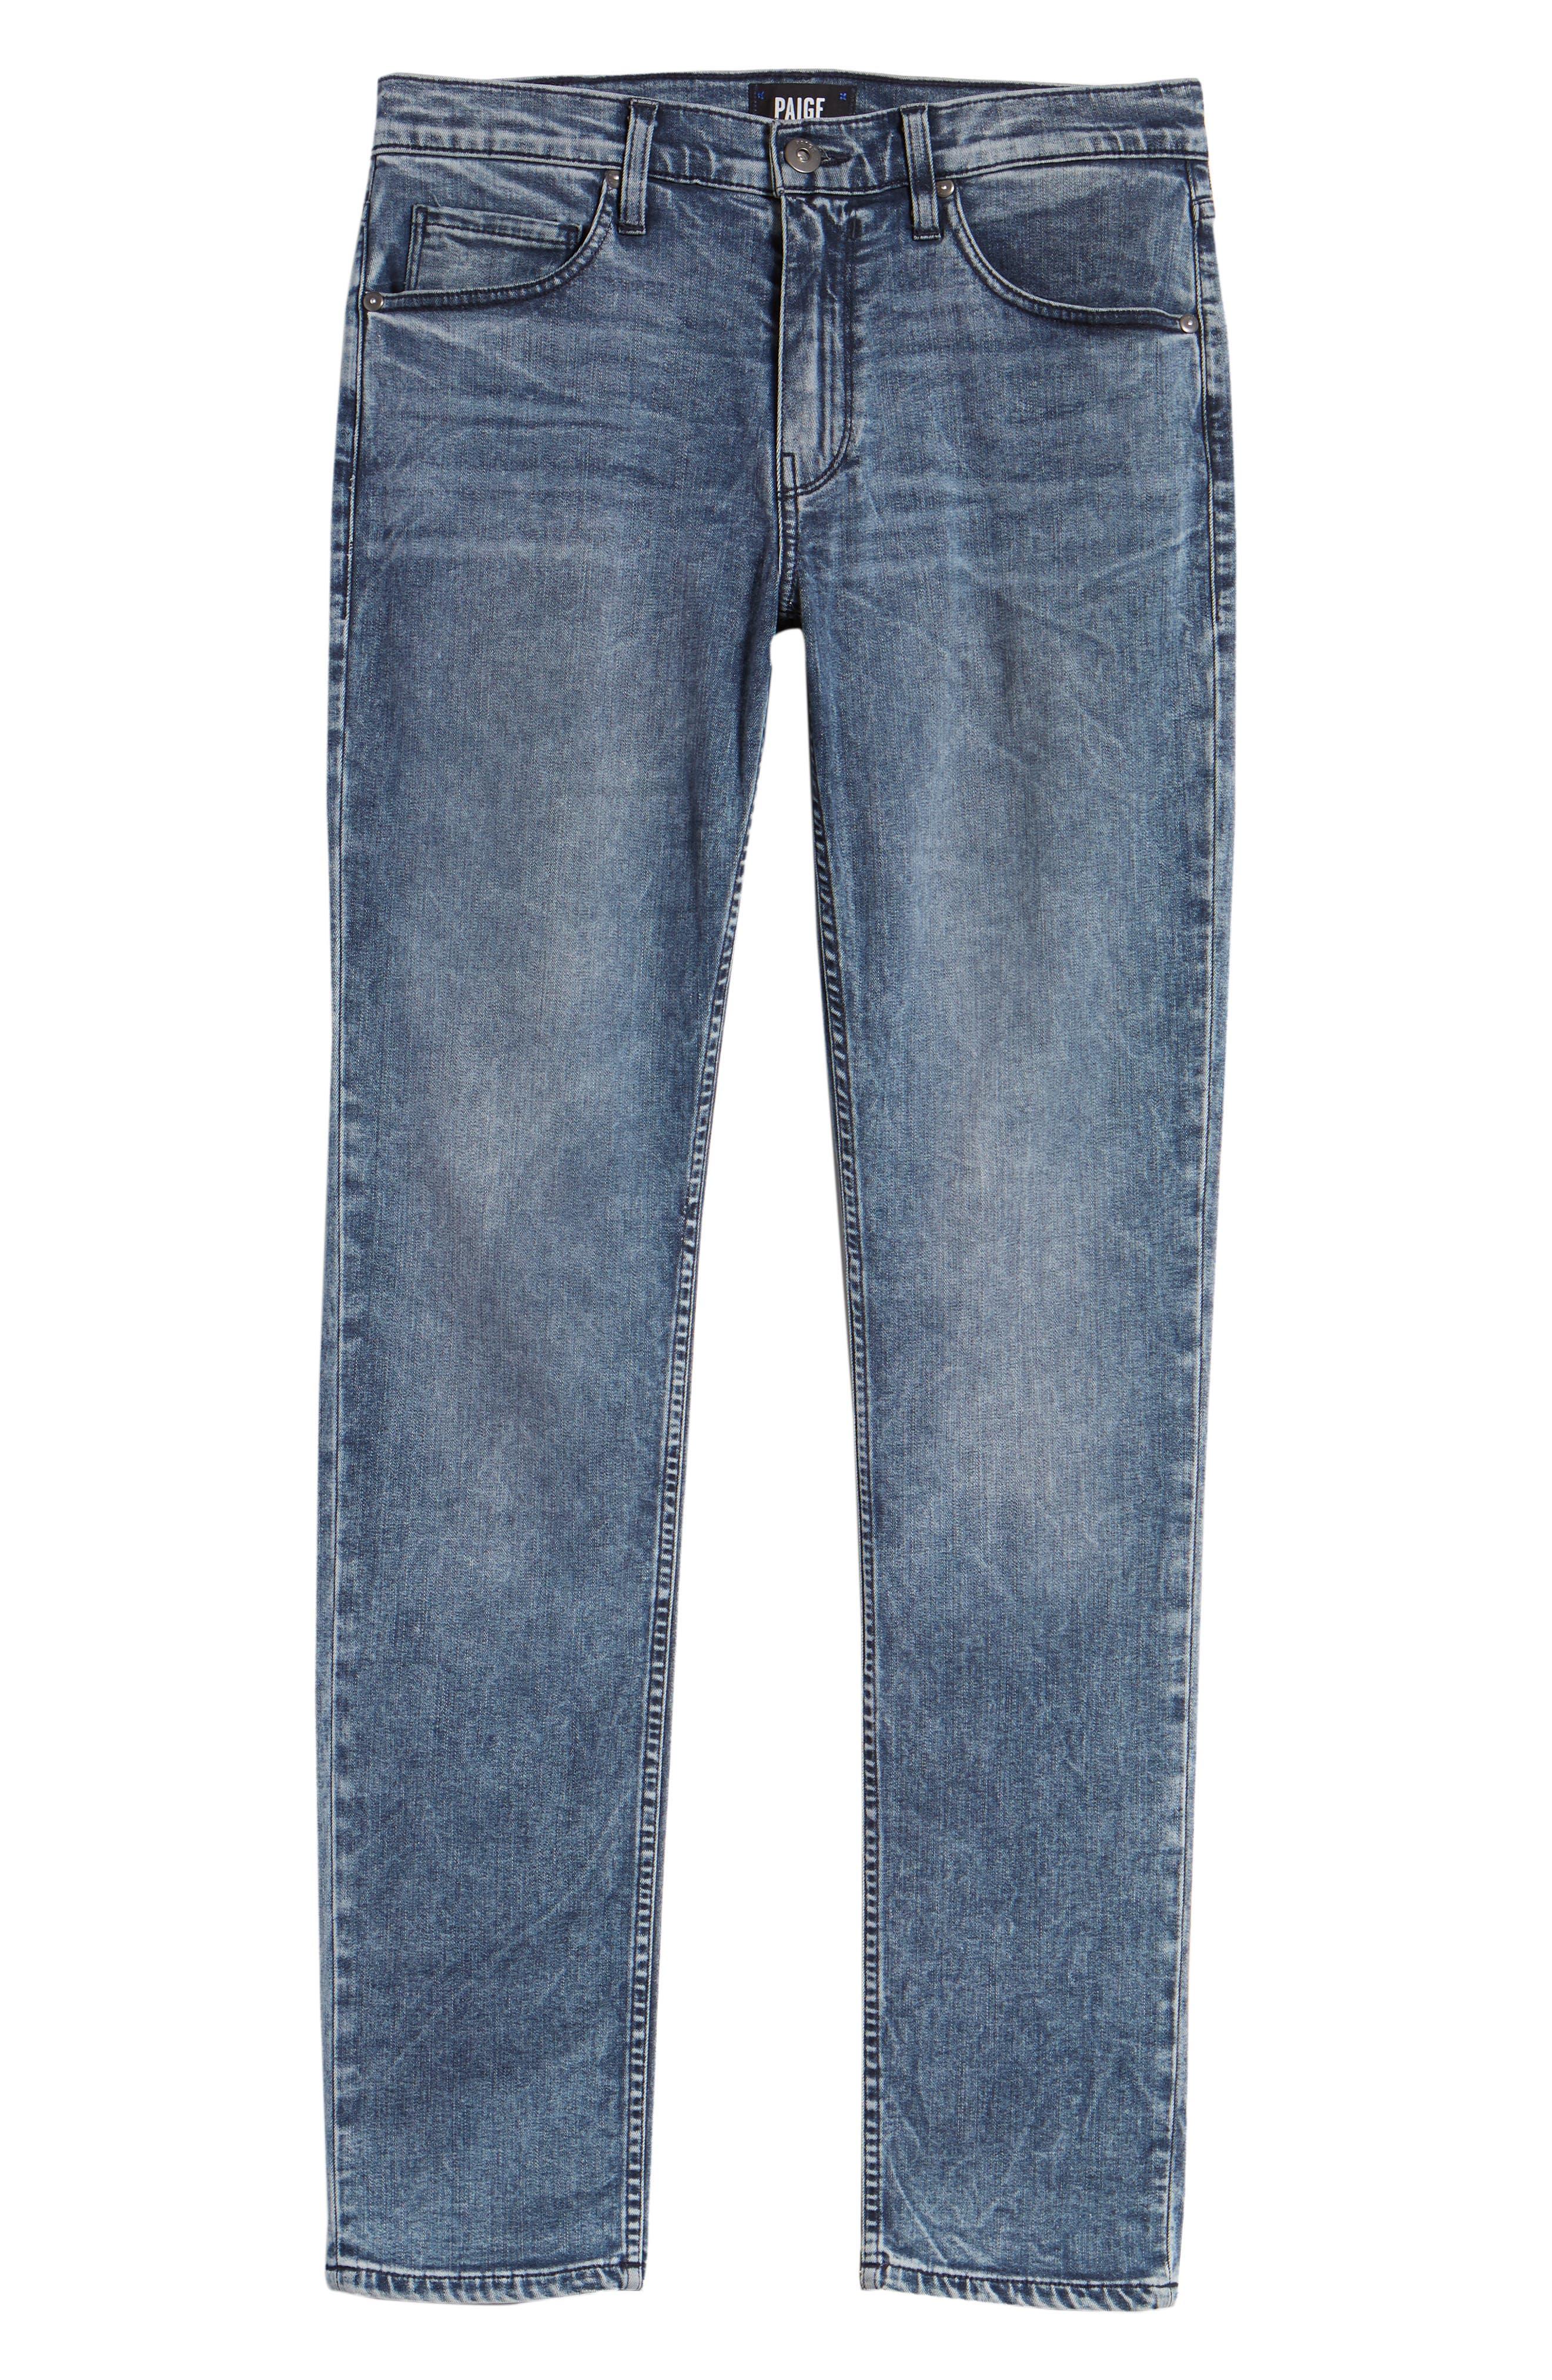 Transcend - Lennox Slim Fit Jeans,                             Alternate thumbnail 6, color,                             Higgs